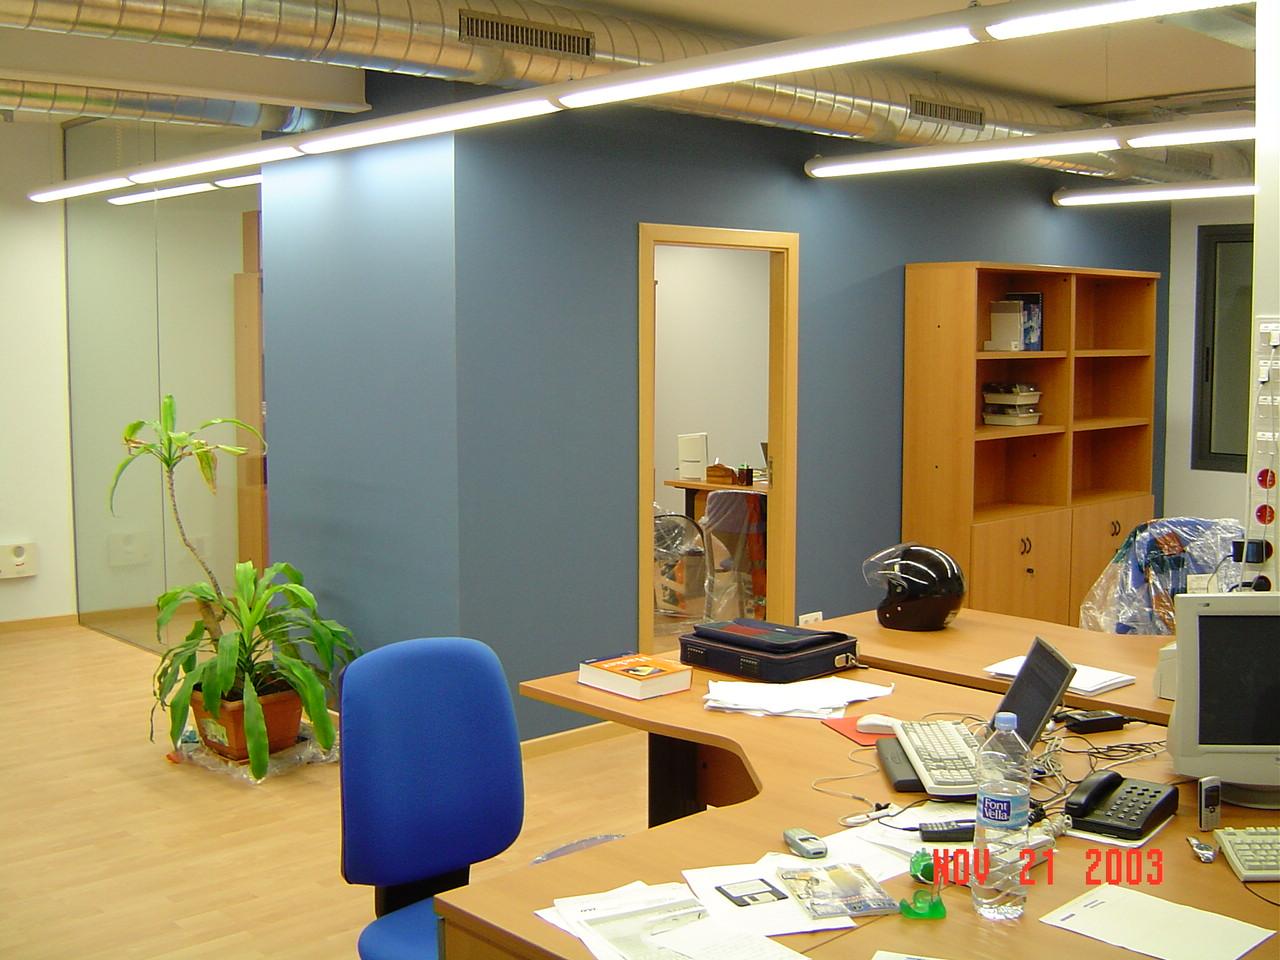 Oficina publica saludable oficina publica saludable for Oficinas interiores